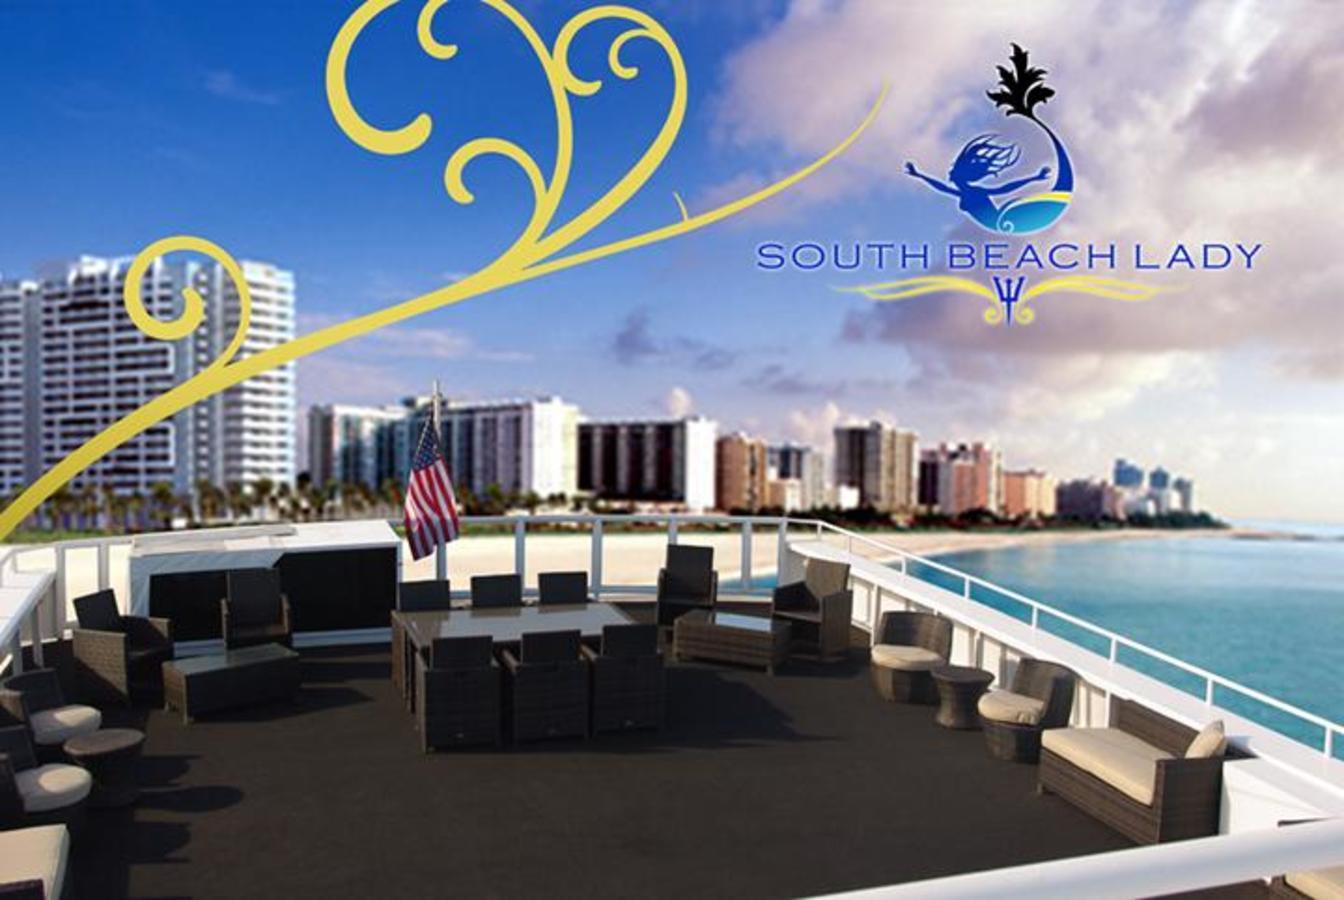 Cabana style open air promenade